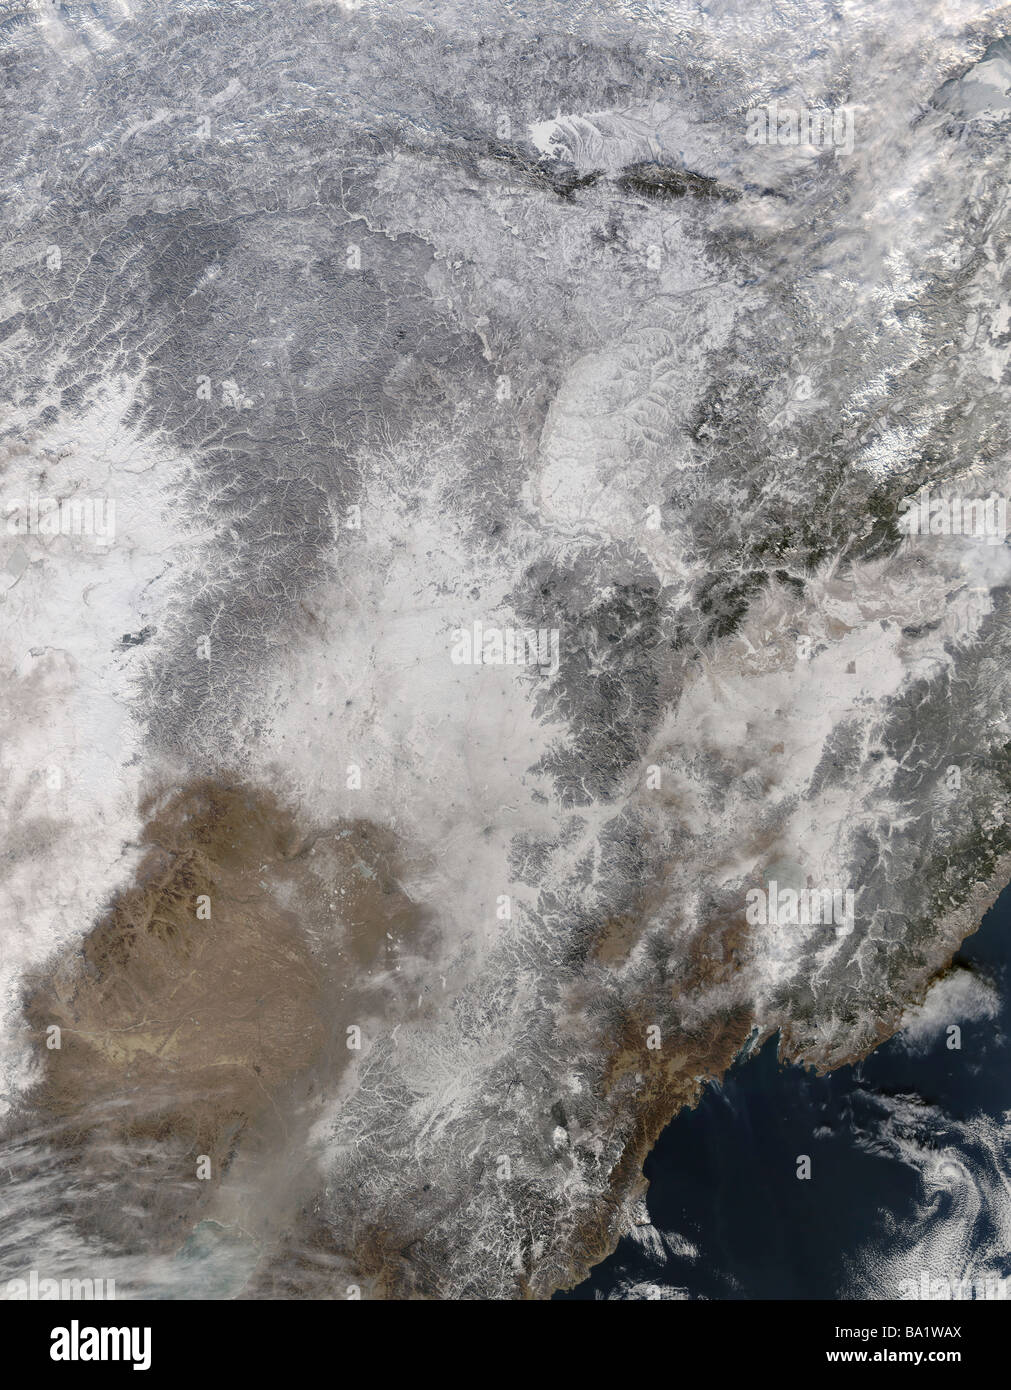 January 3, 2009 - Northeastern China - Stock Image